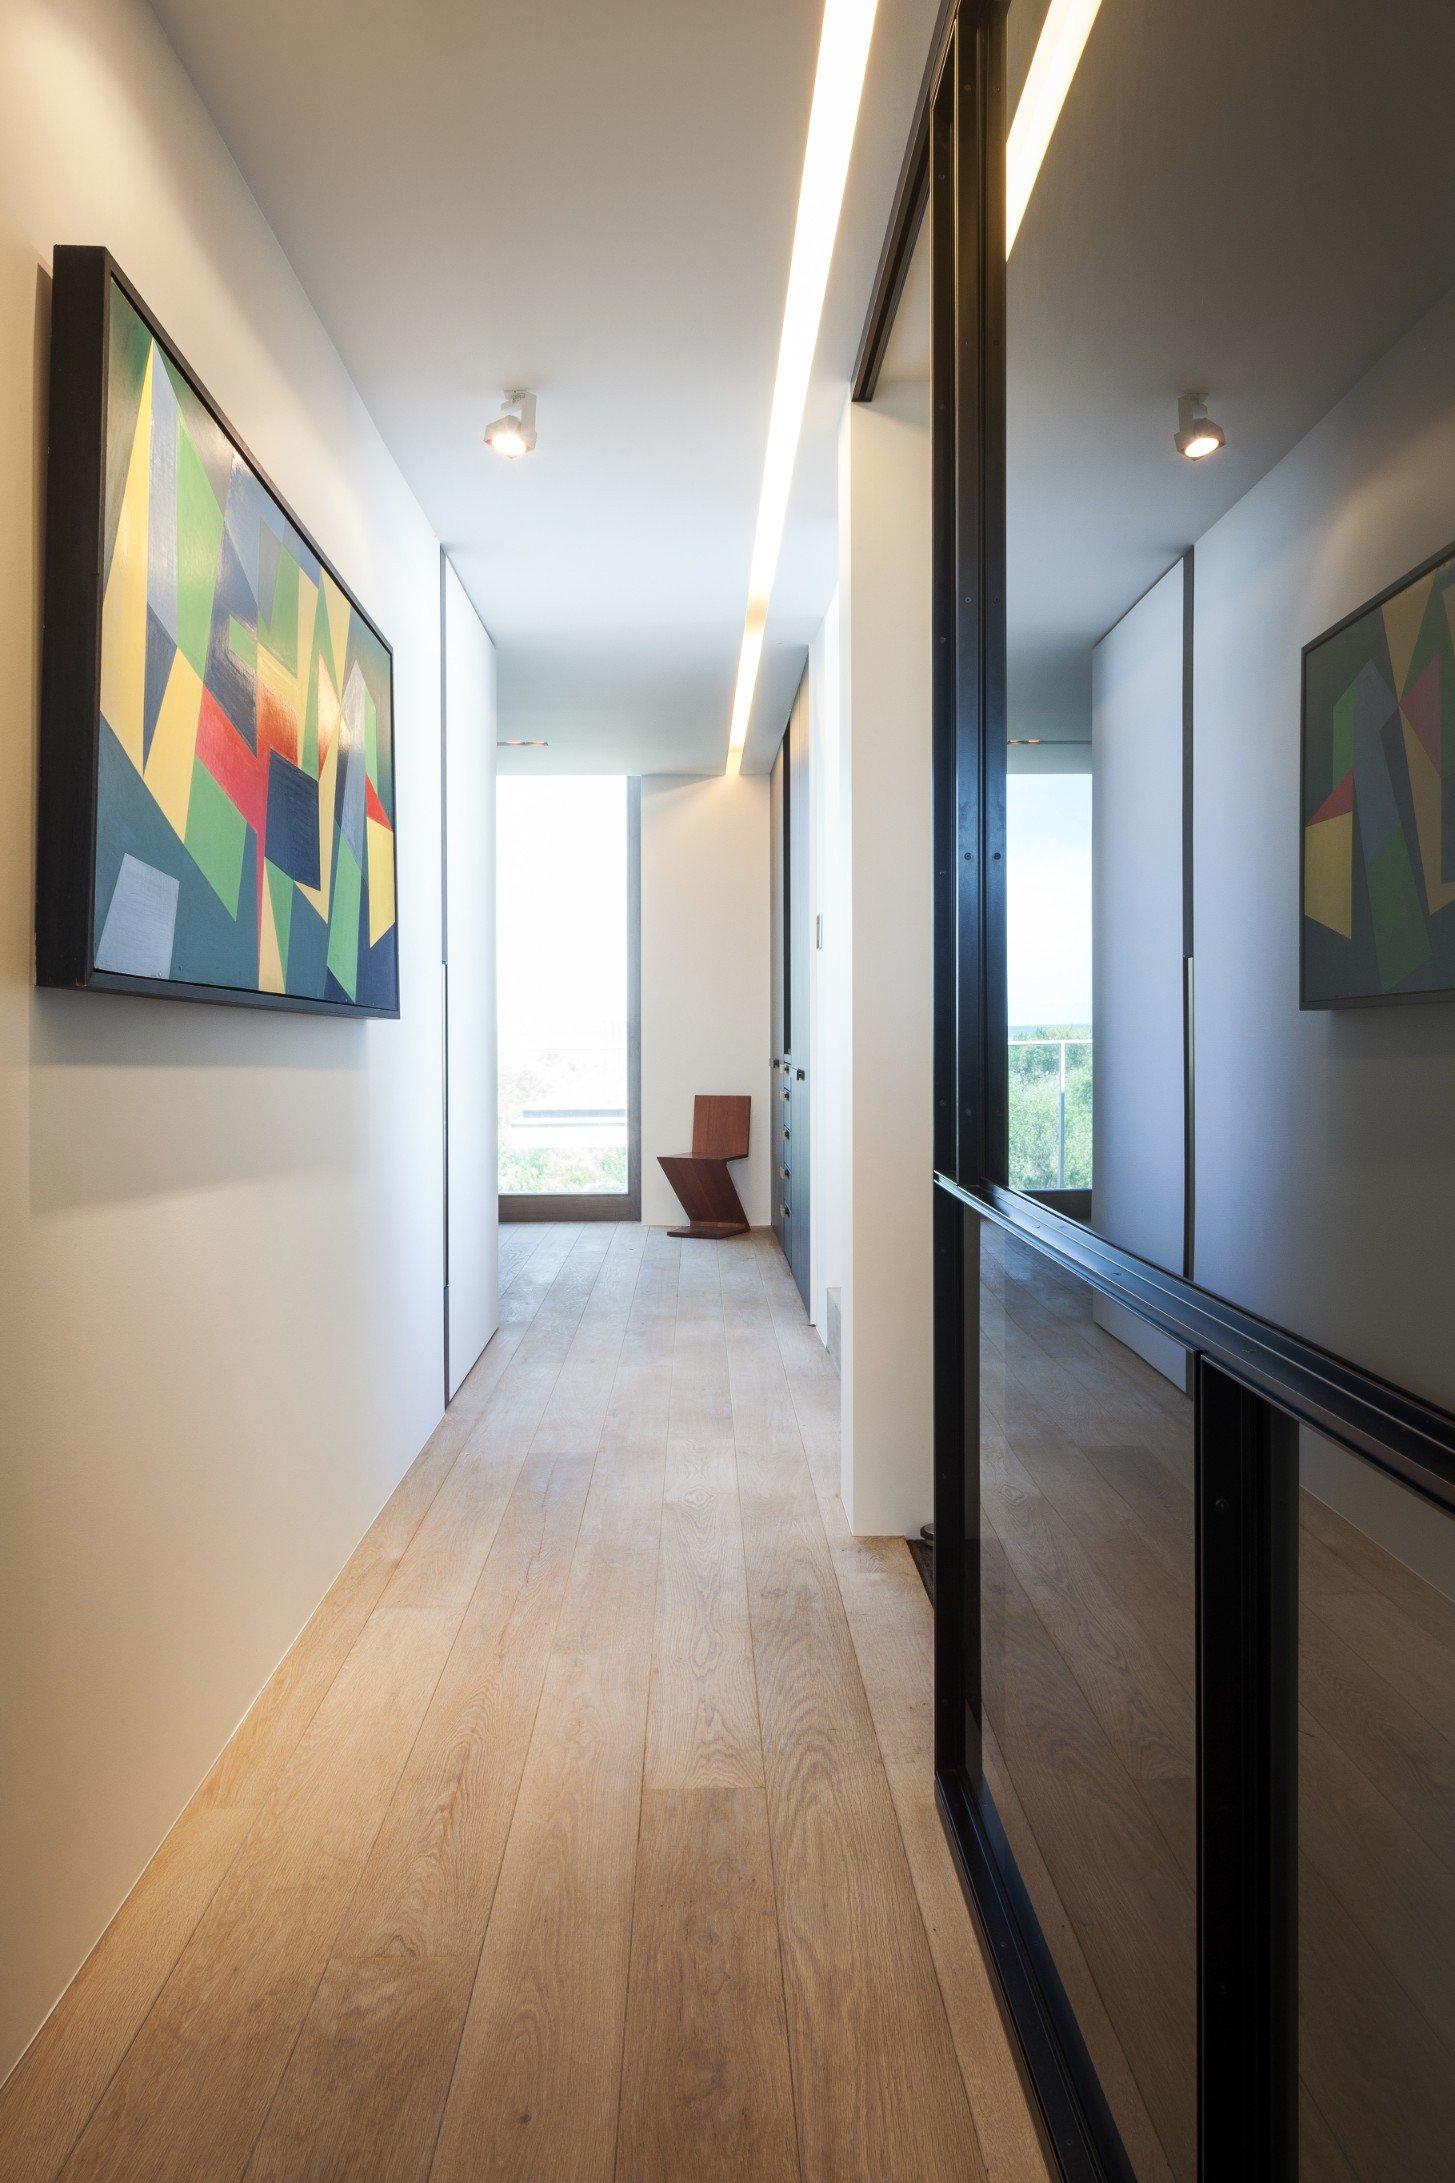 Rietveldprojects-penthouse-appartement-design-architectuur-kust2